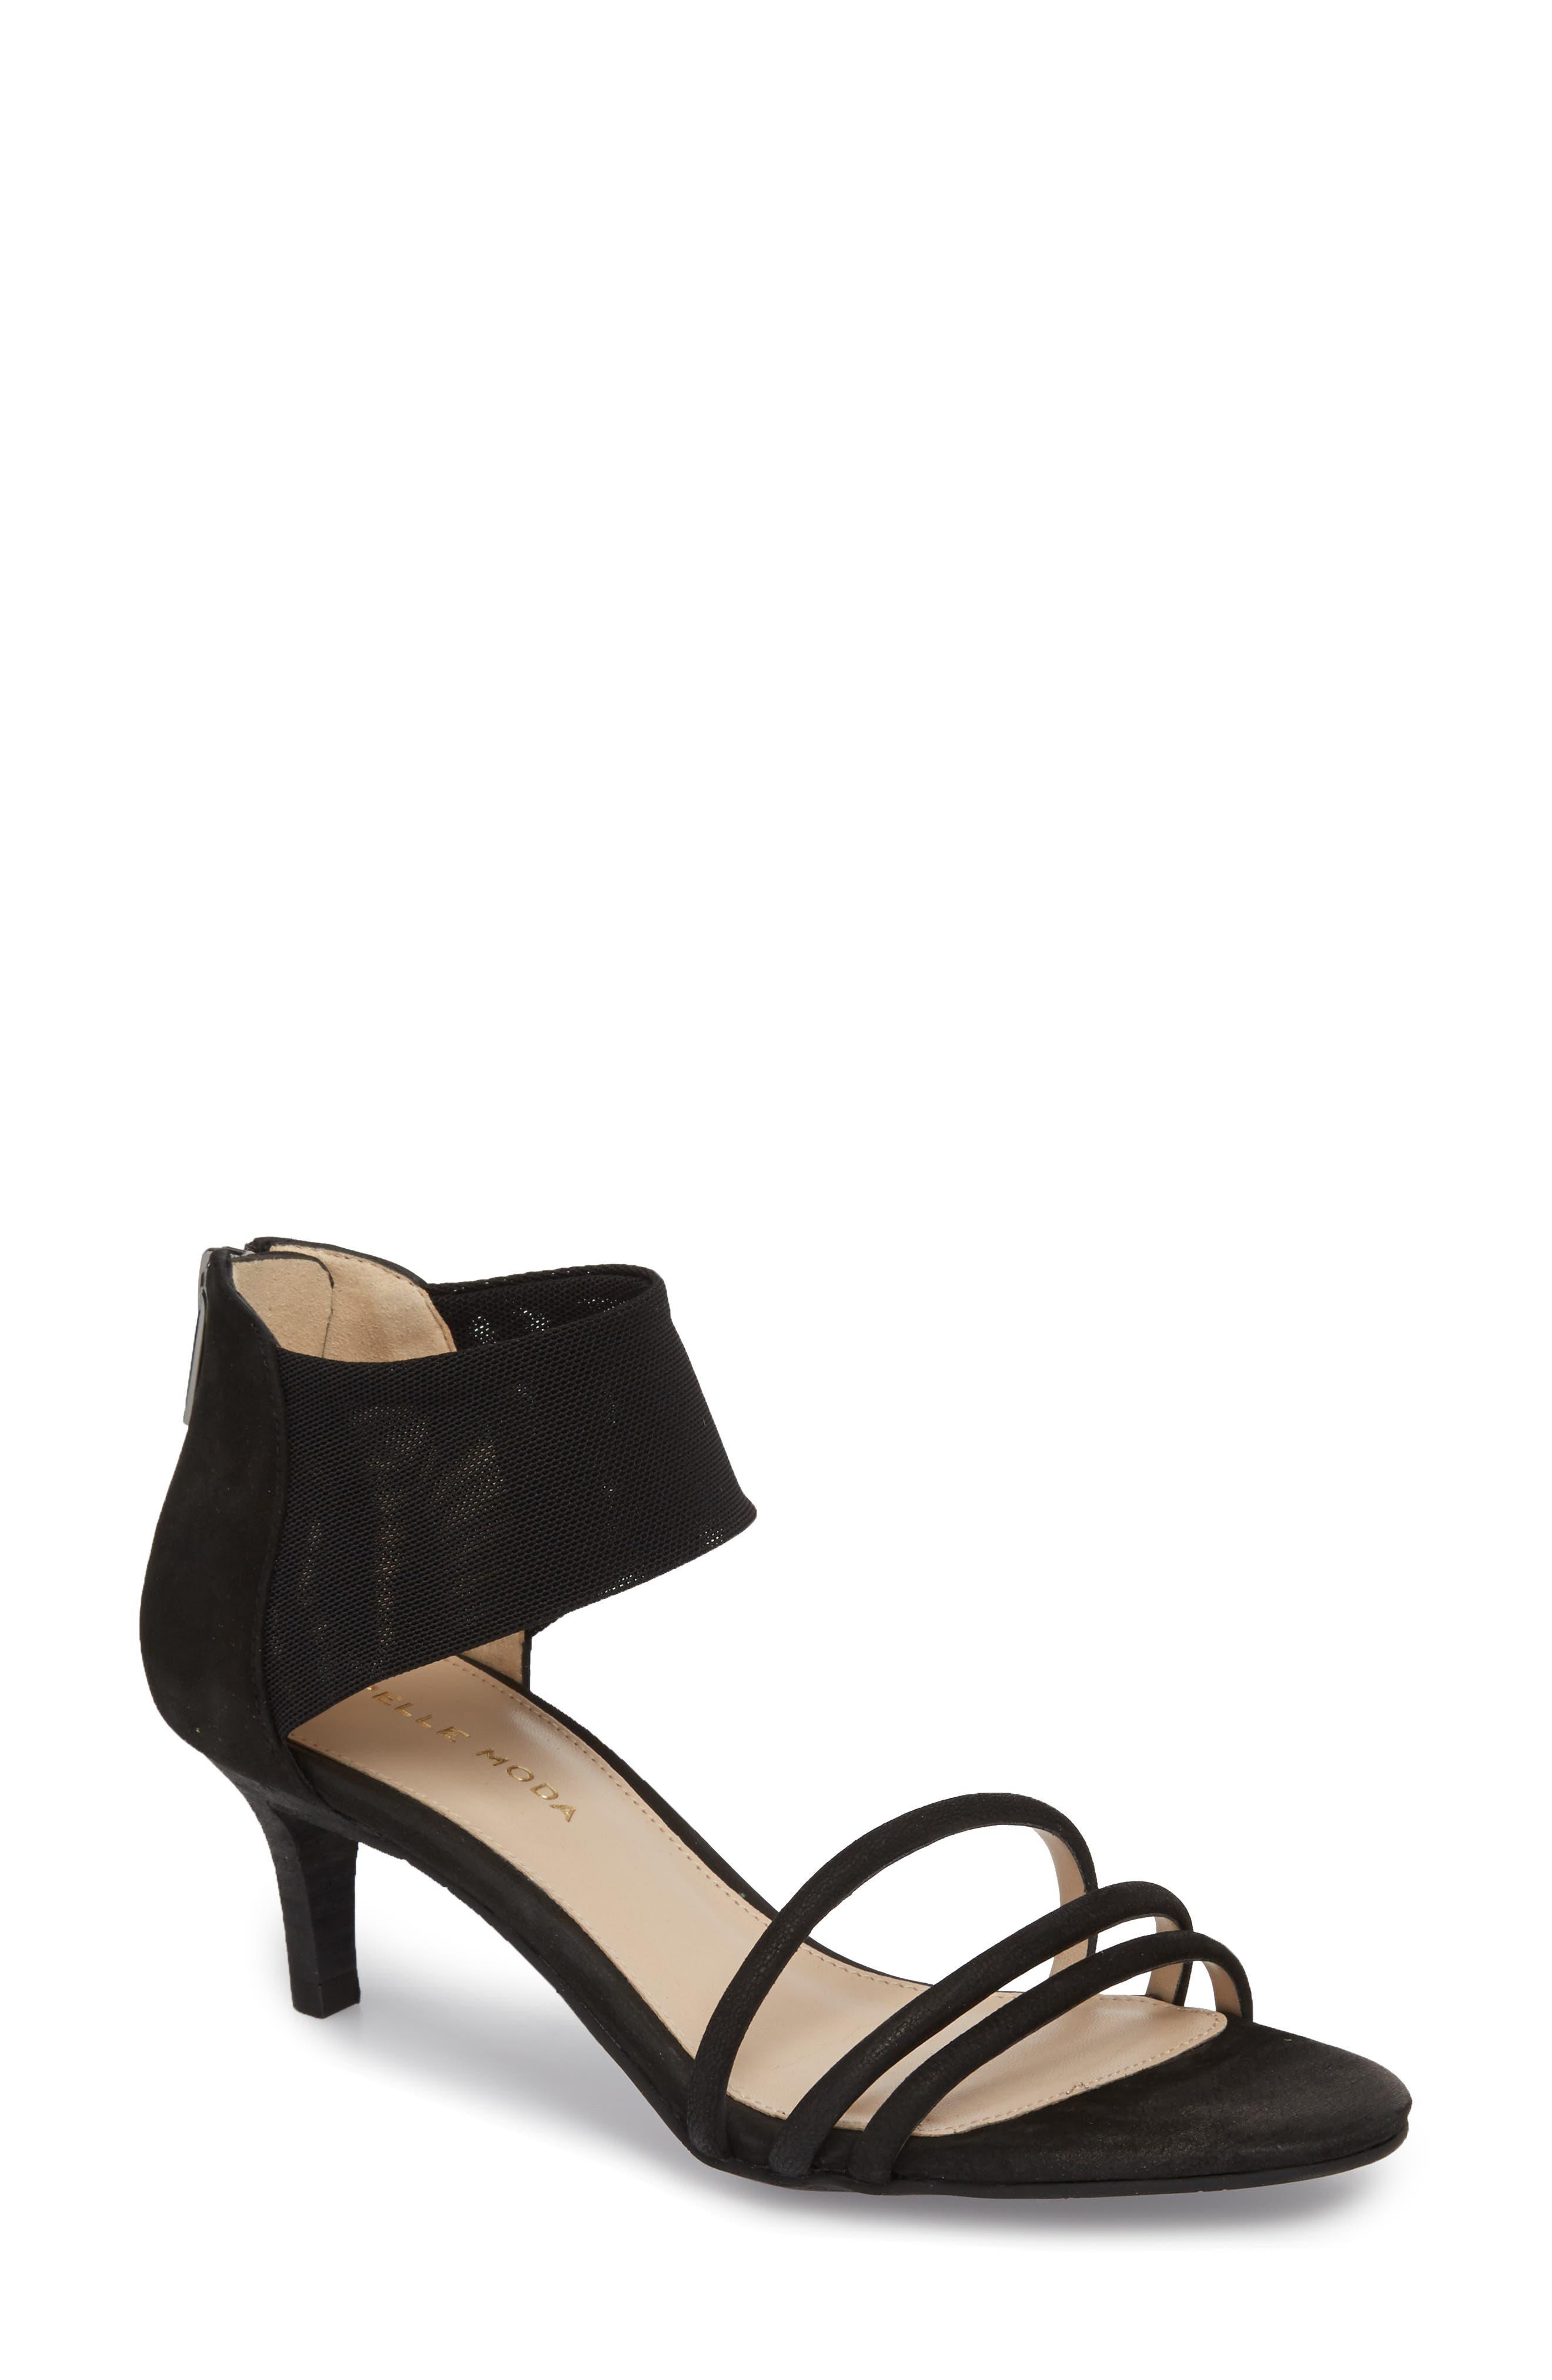 Berri Ankle Cuff Sandal,                             Main thumbnail 1, color,